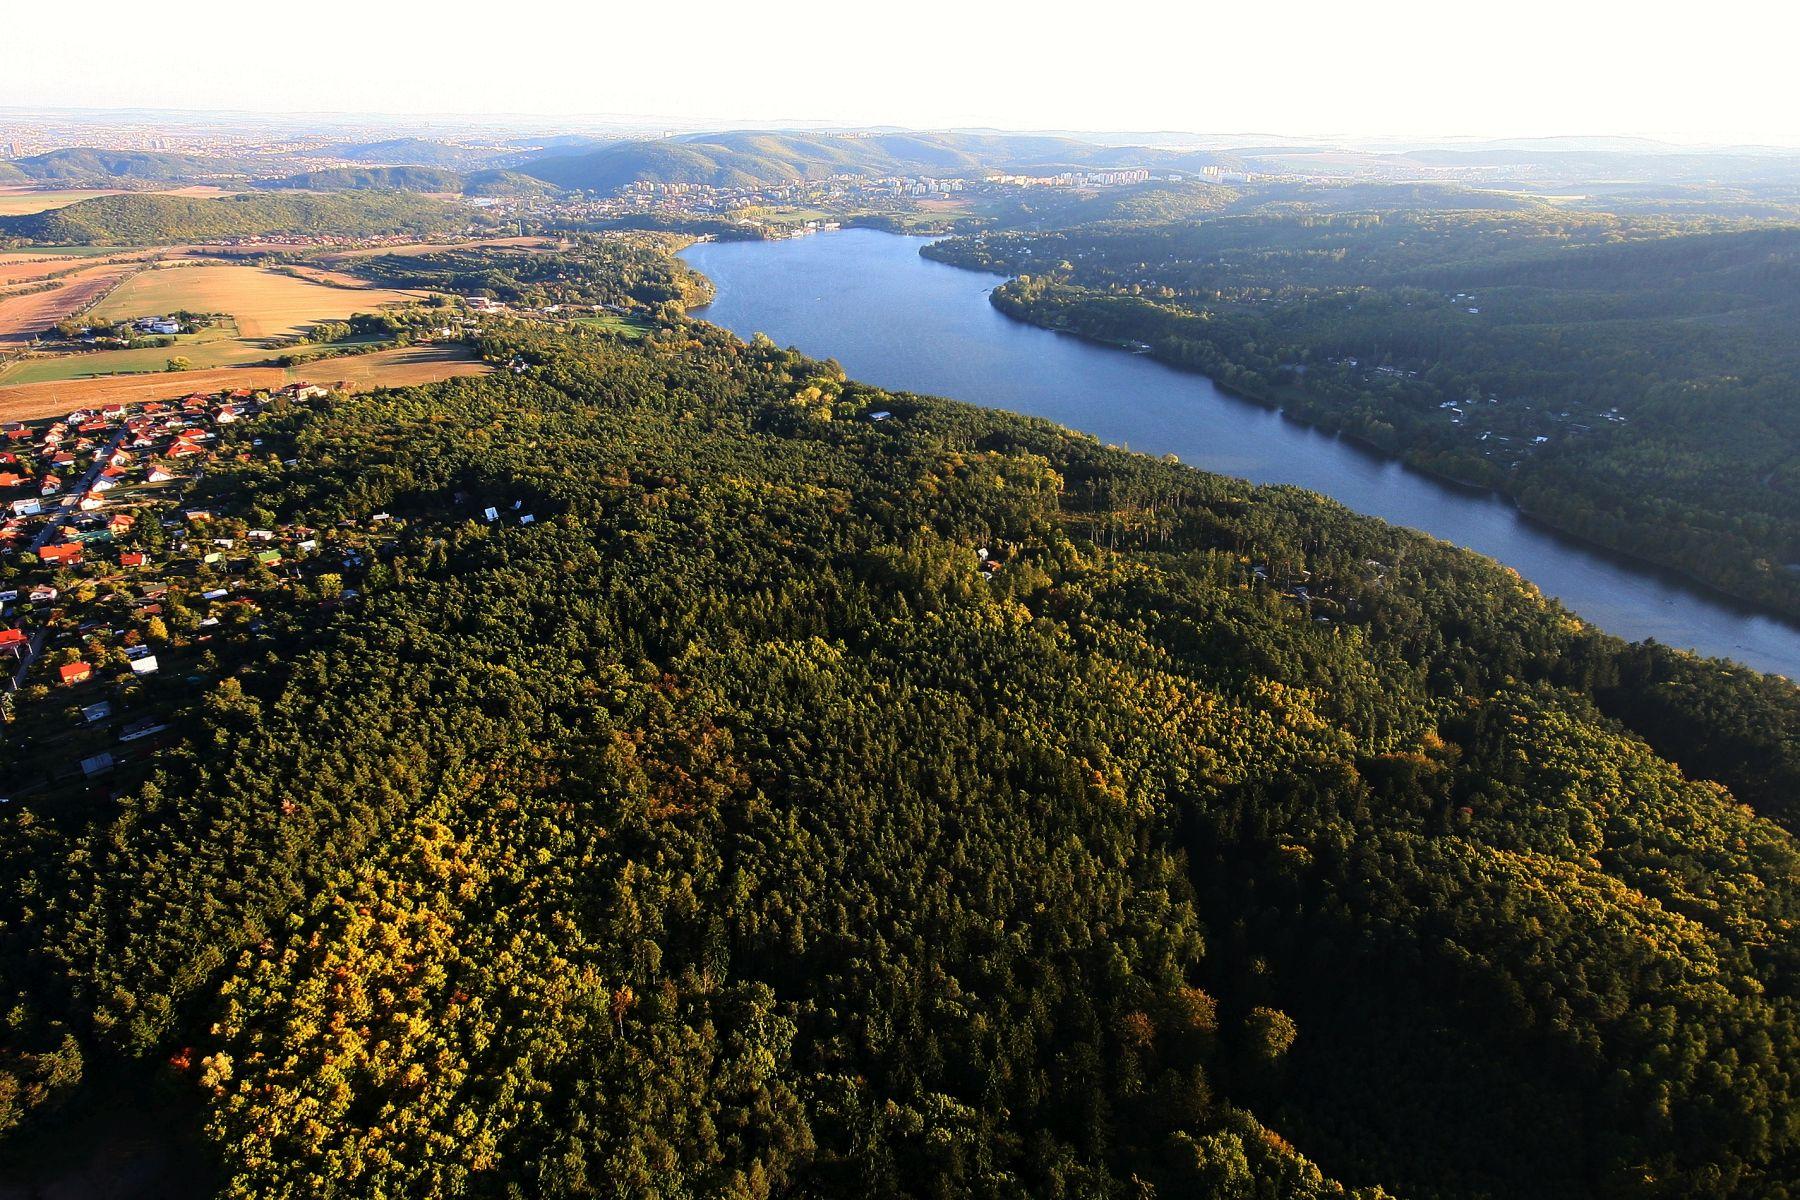 Brněnská přehrada